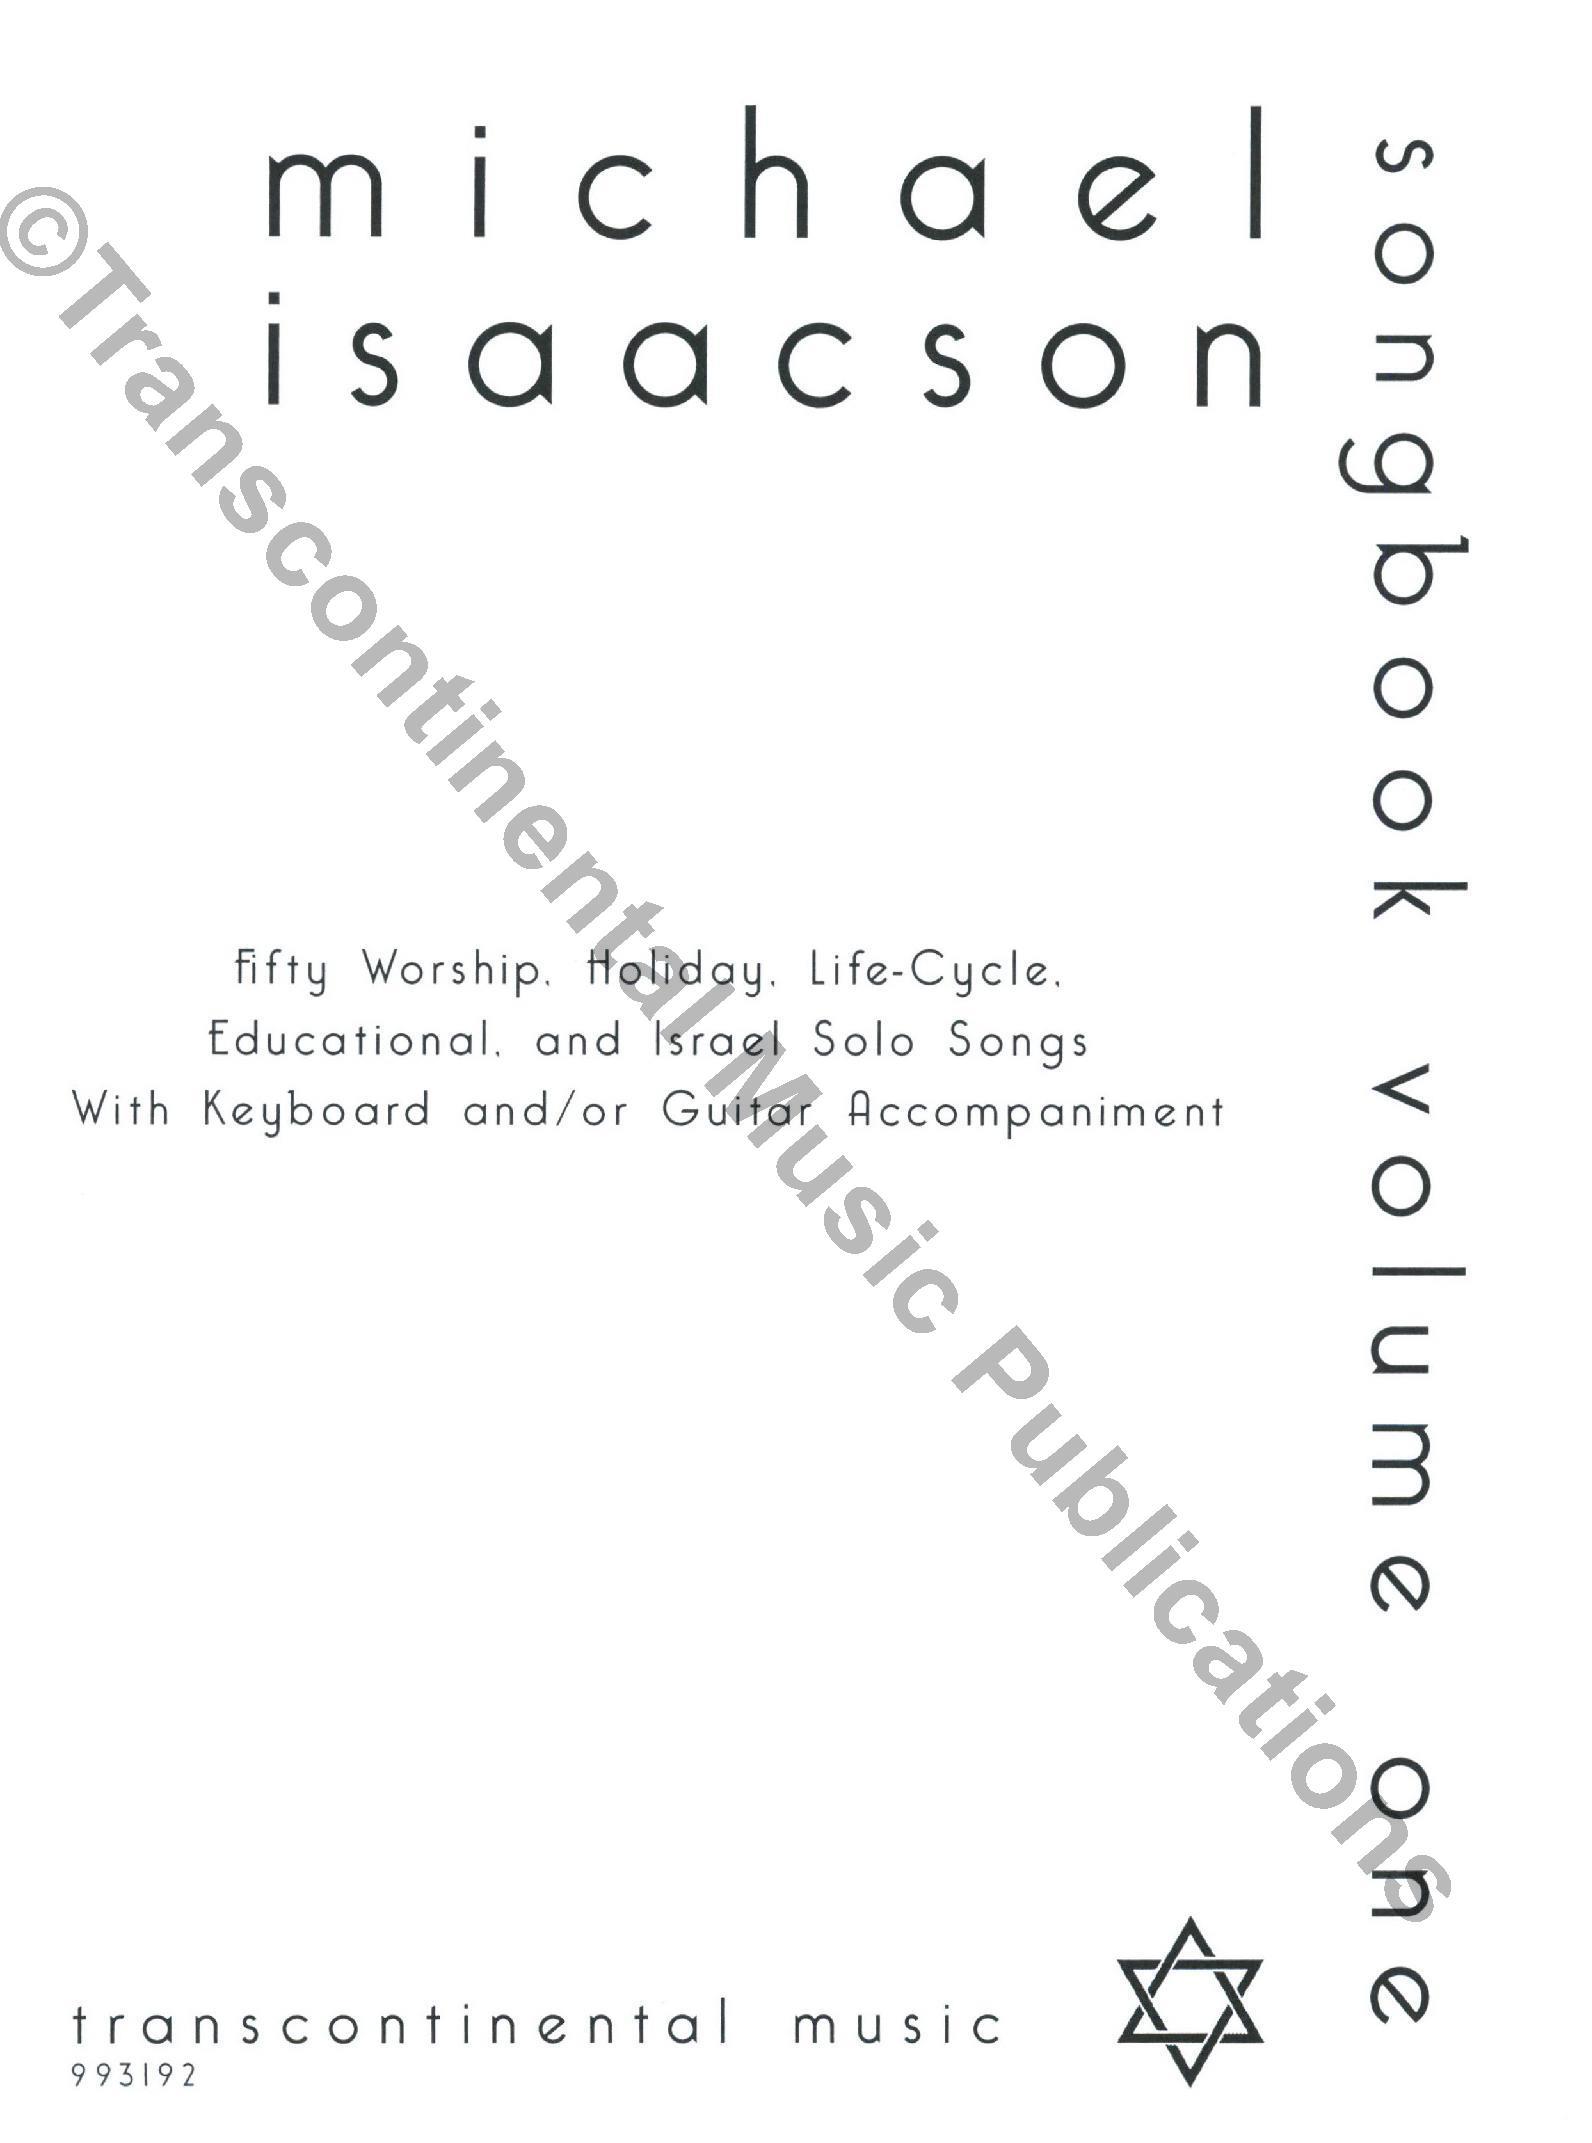 Michael Isaacson Songbook Volume I